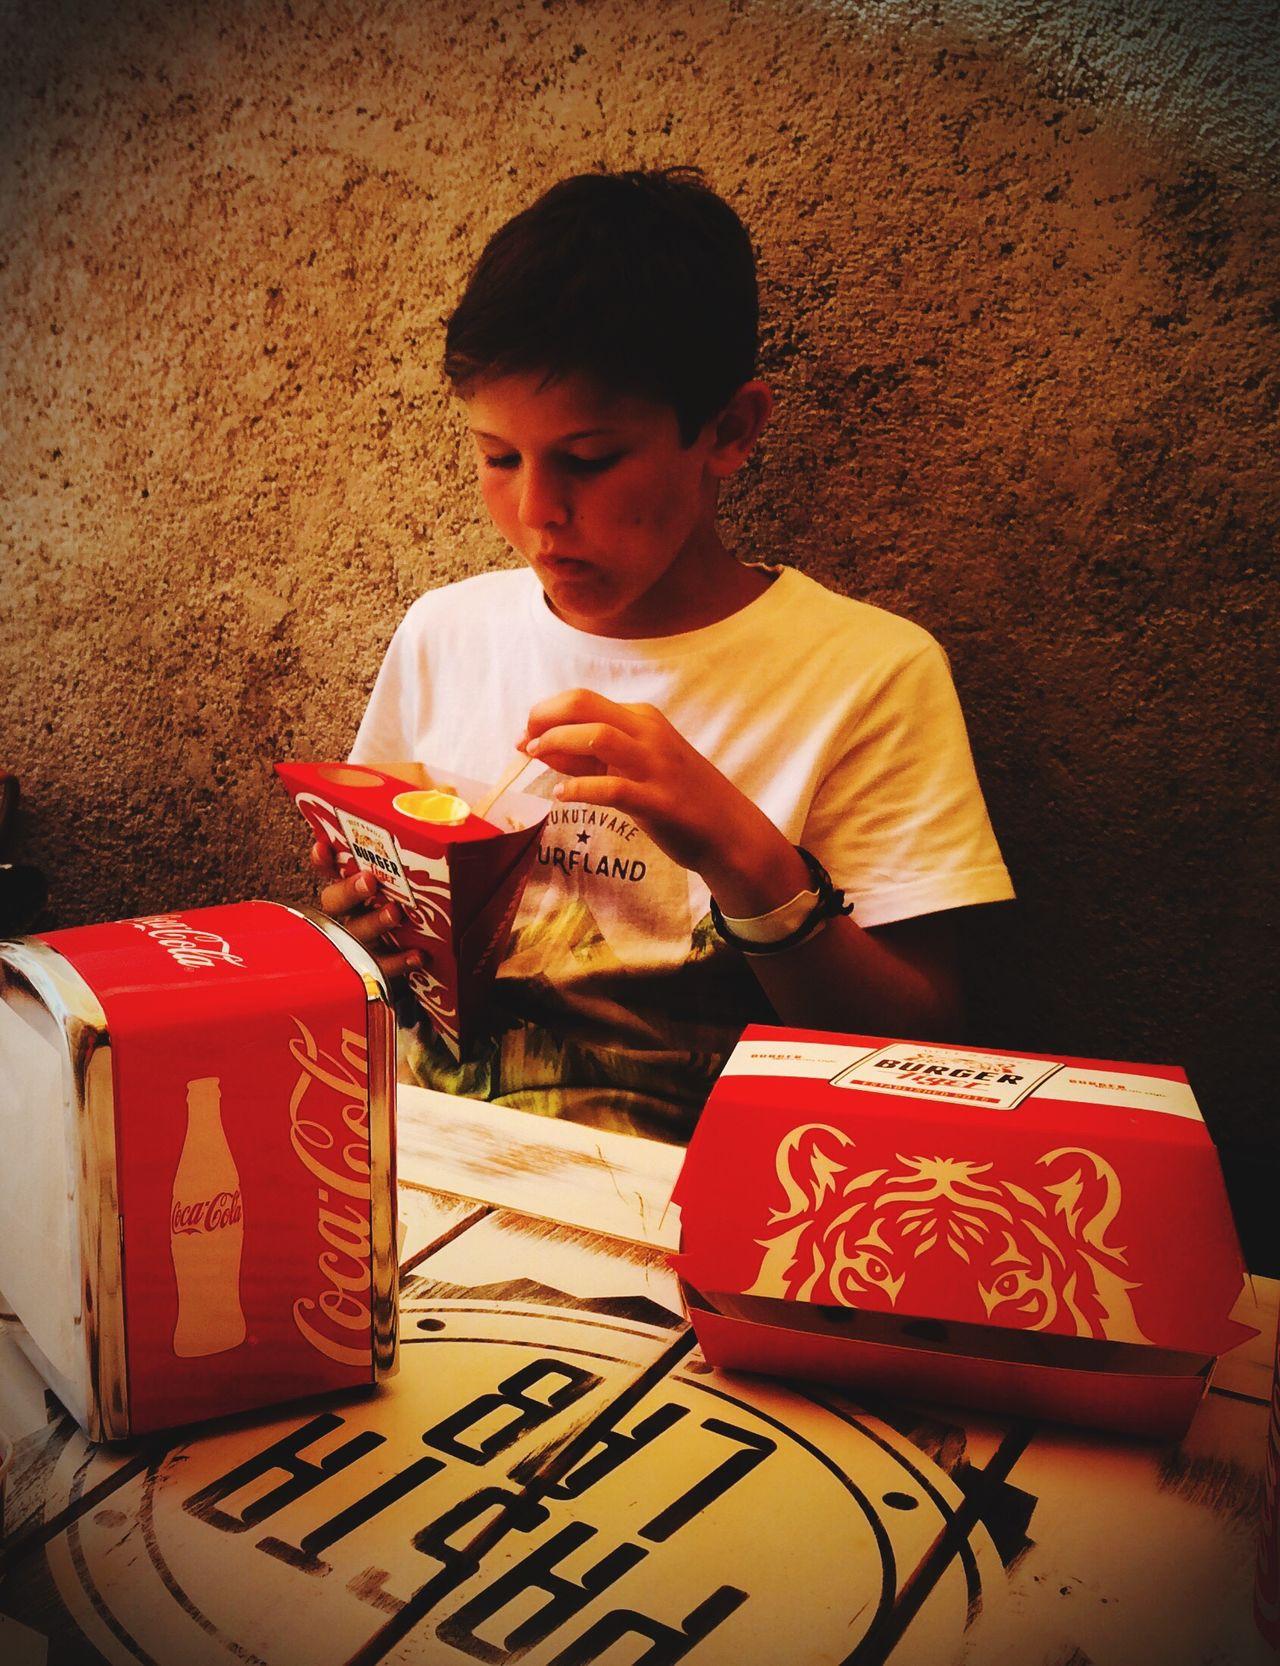 Street food Eat Food Boxes Fast Eating Kid Eating Red Box